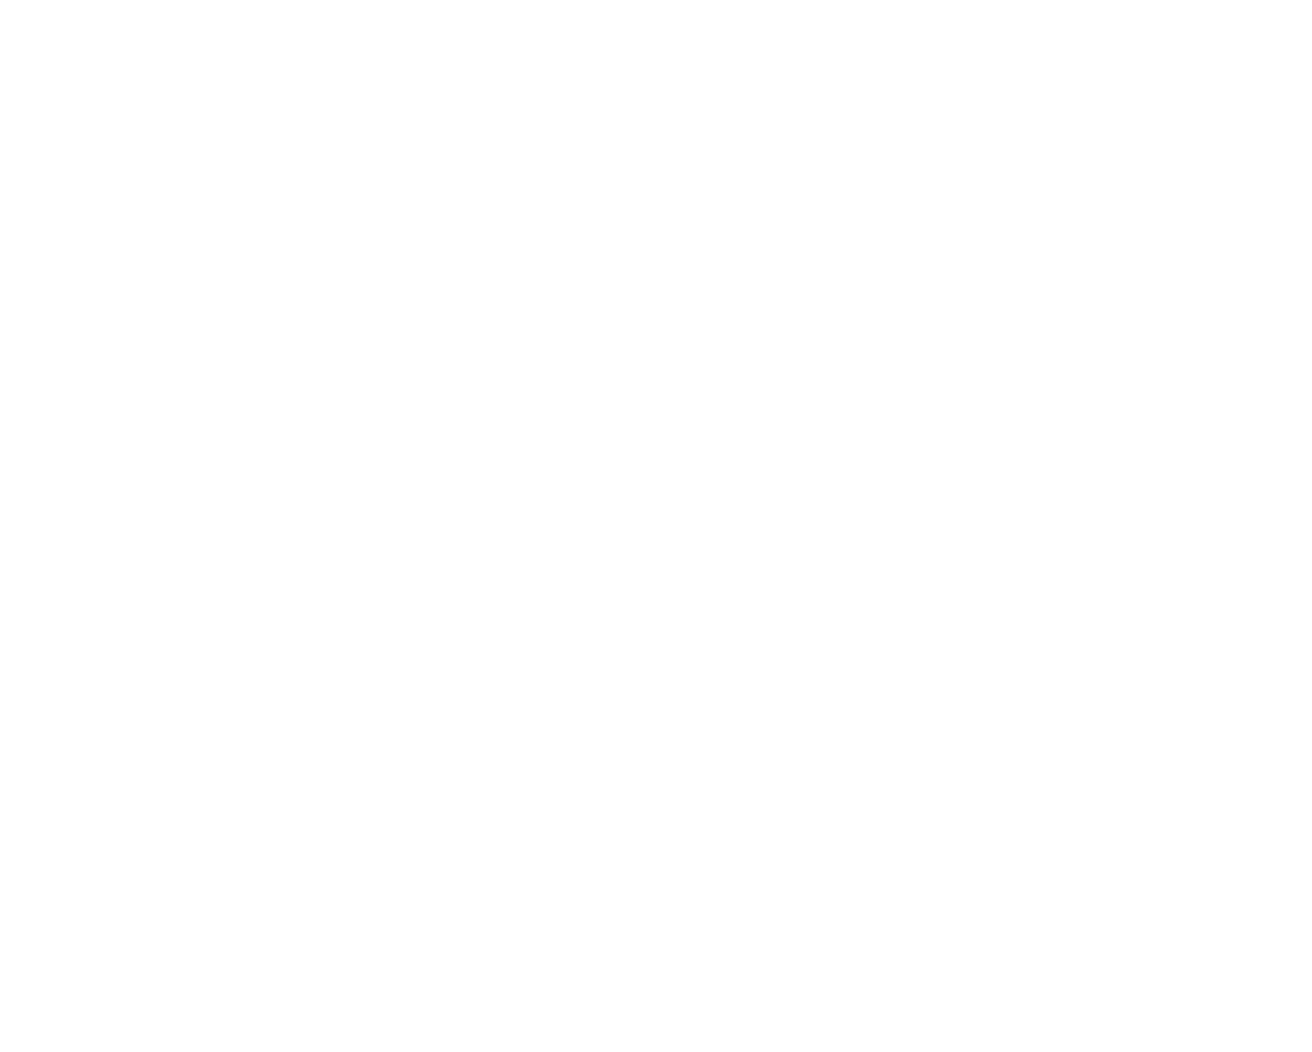 OUR PRIDE SINCE1909 私たちの仕事は、明日のための仕事です。